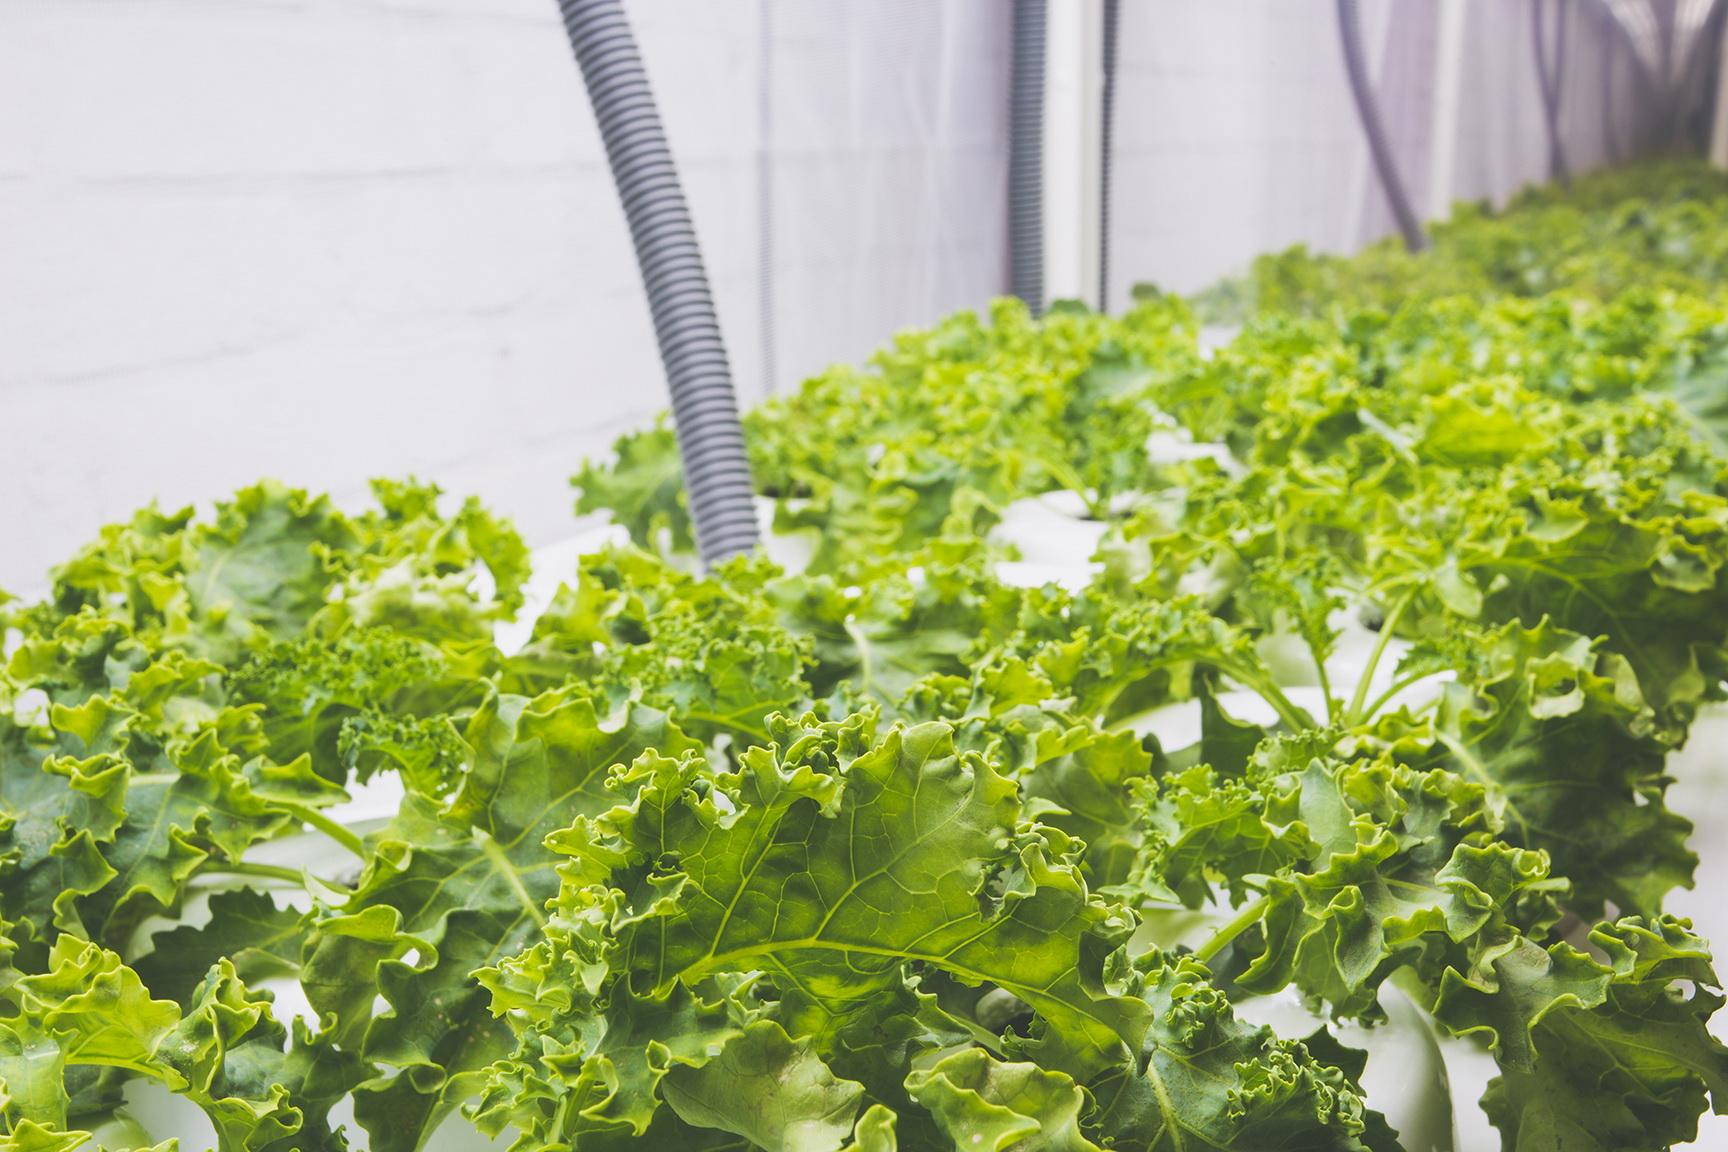 Couve variedade Kale  cultivada em estufa   foto: Emmanuel Denauí